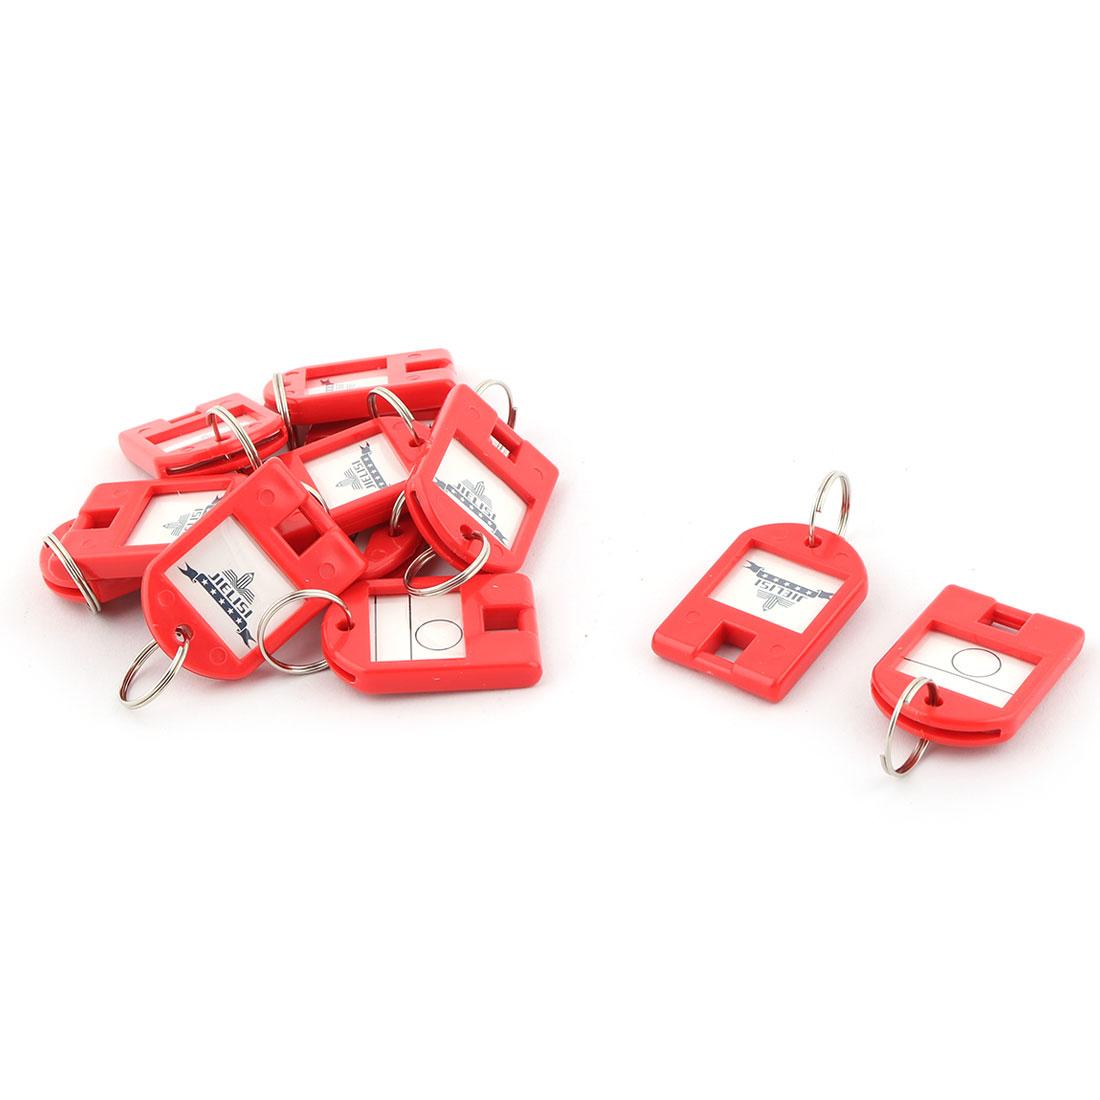 Plastic ID Label Name Tag Mark Metal Ring Key Fobs Luggage Bag Keyring Keychain Red 12pcs